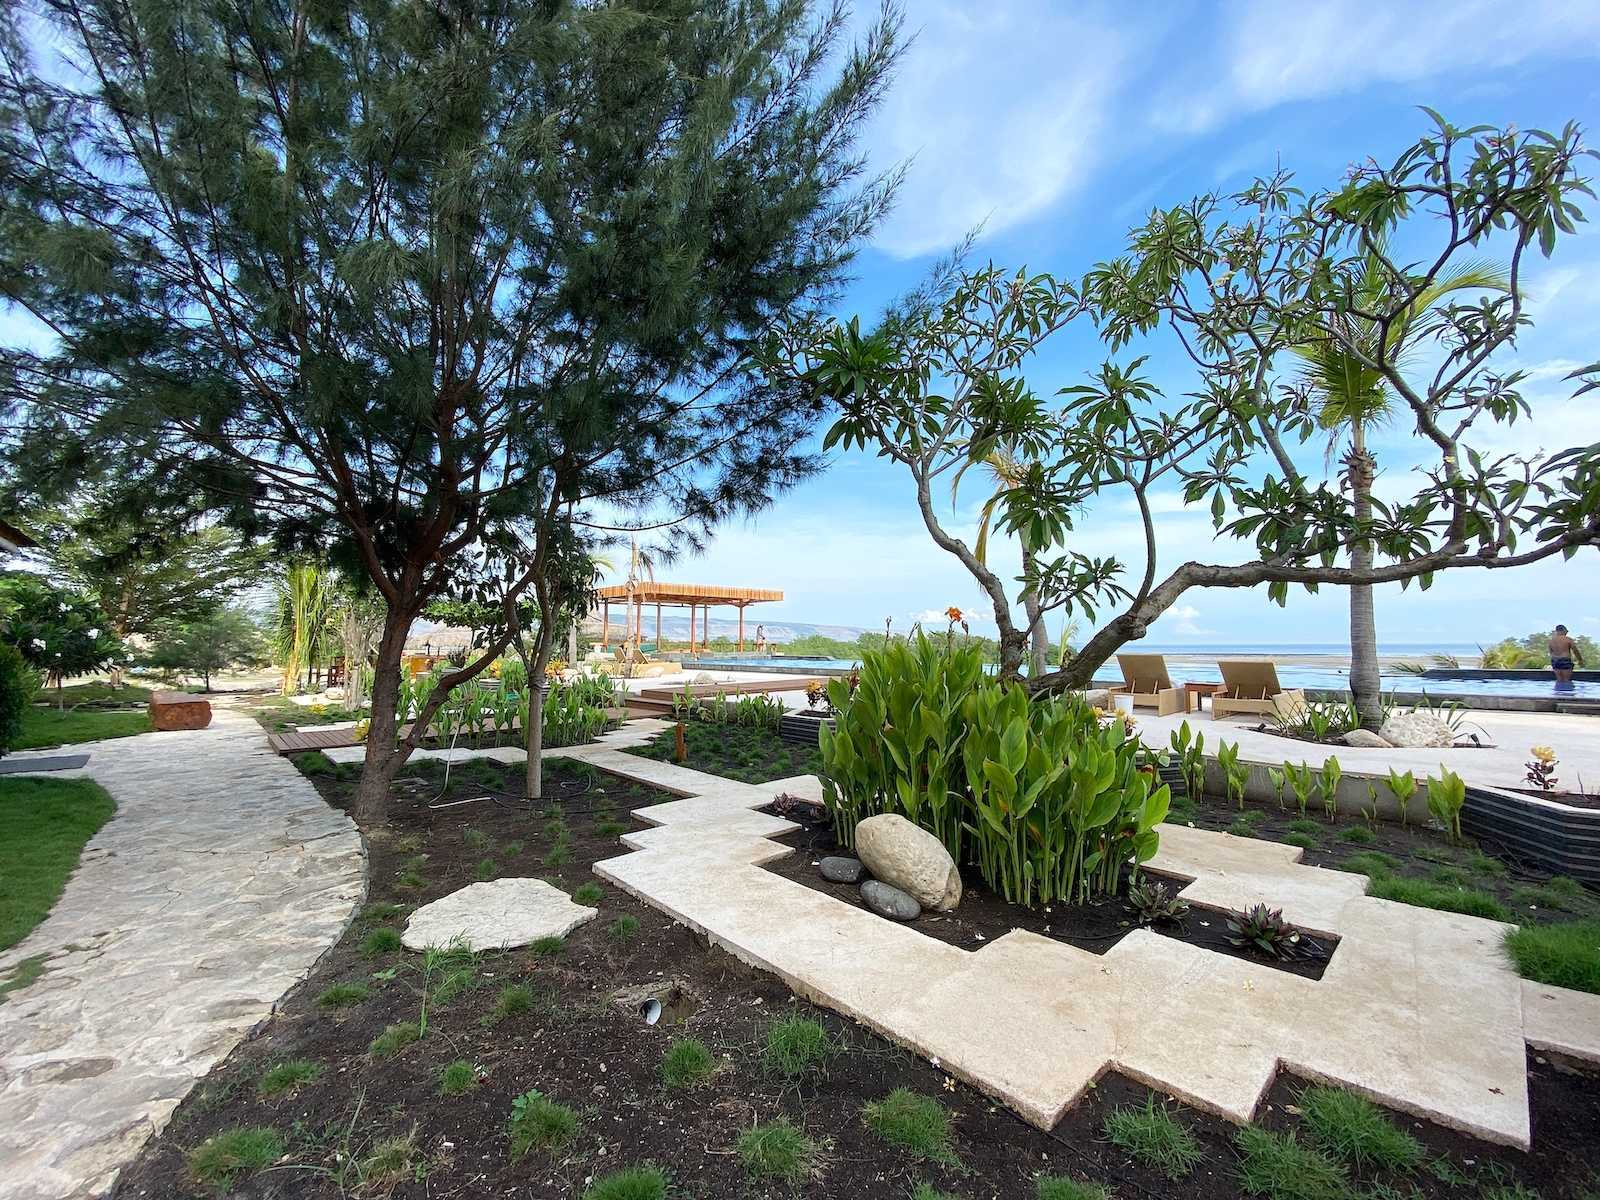 Studio Asri Sumba Beach Hotel Pulau Sumba, Nusa Tenggara Tim., Indonesia Pulau Sumba, Nusa Tenggara Tim., Indonesia Studio-Asri-Sumba-Beach-Hotel  107220